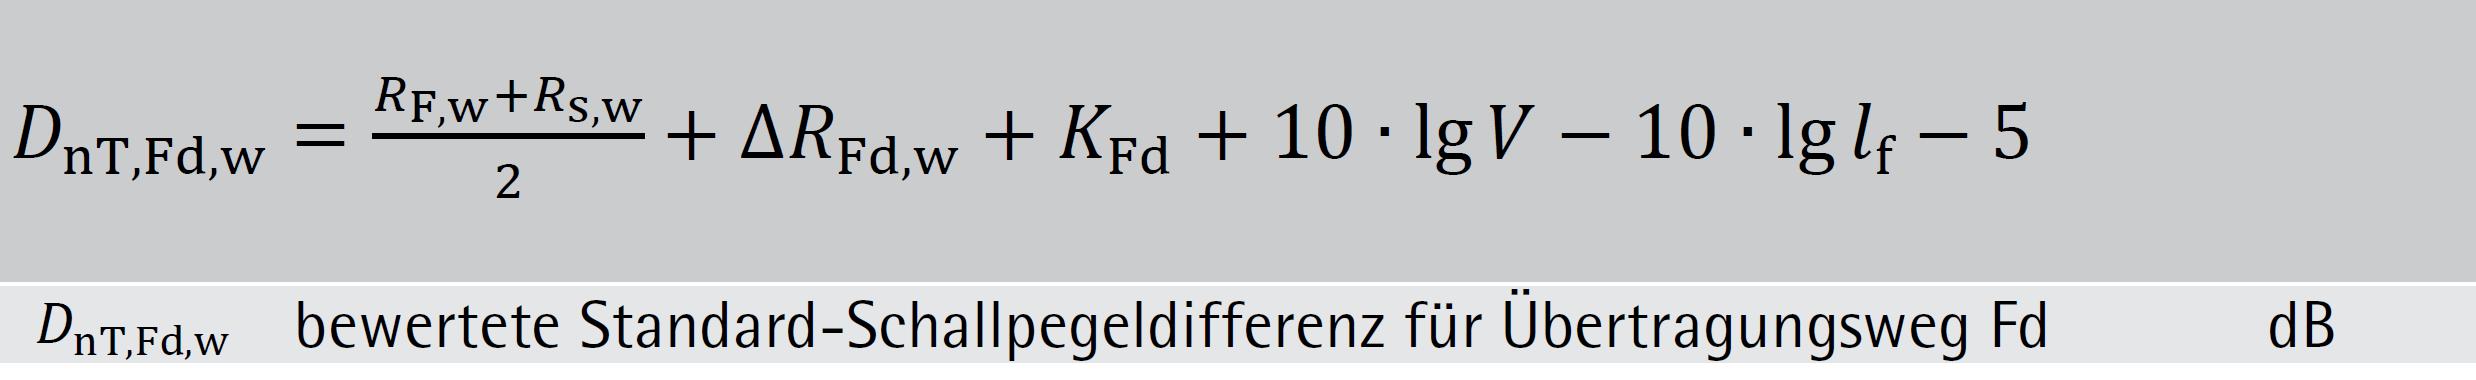 Fomrel (3-23)